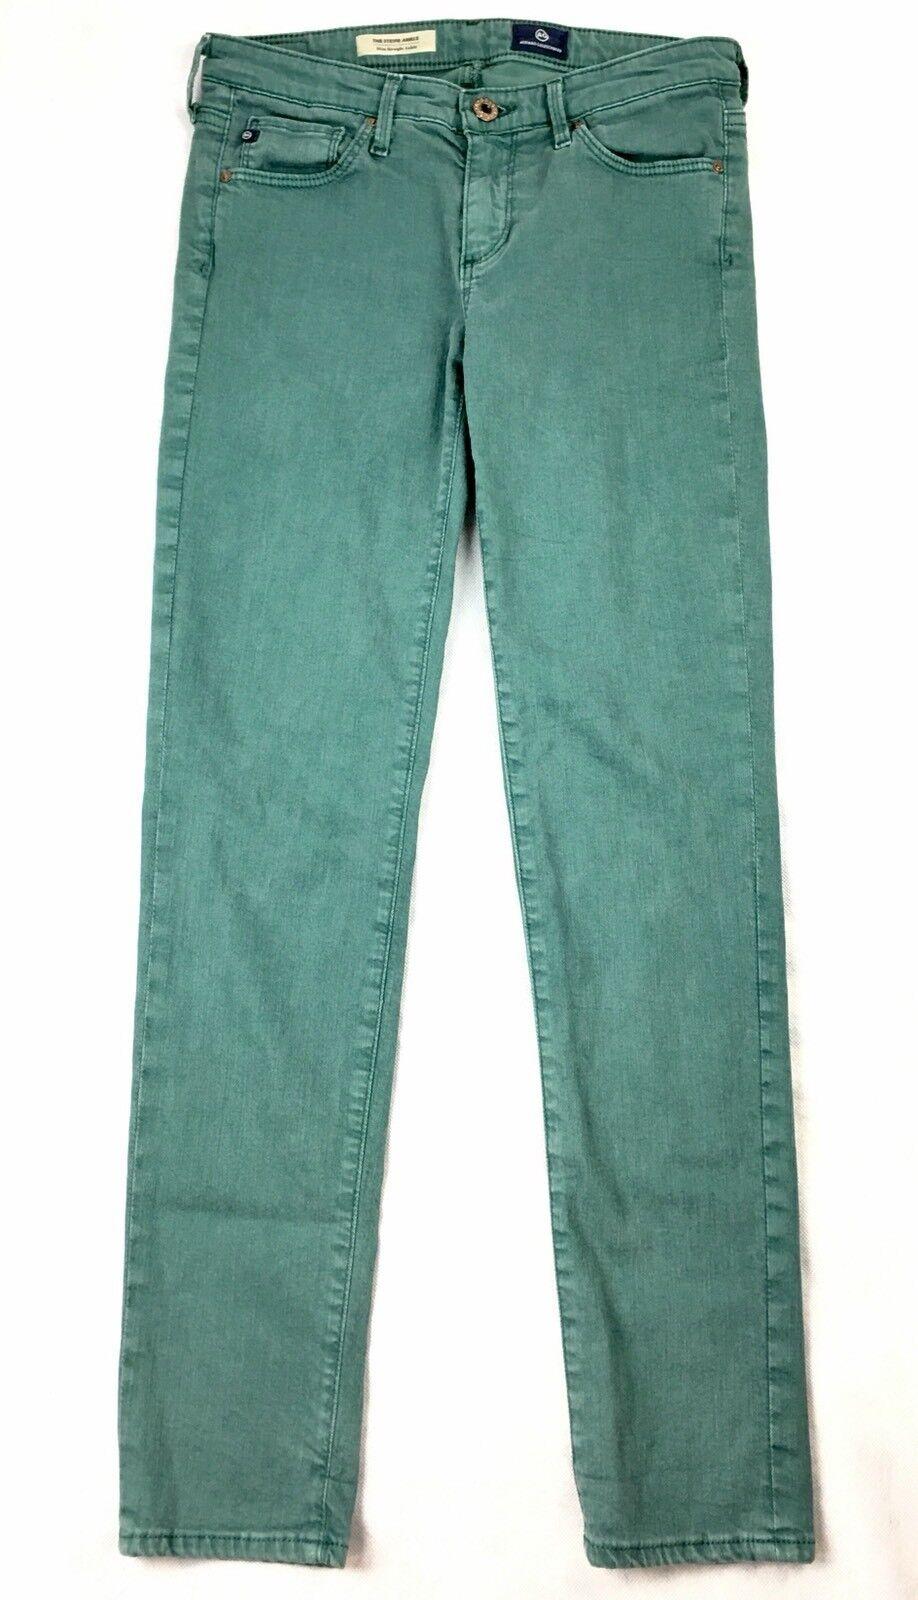 AG Adriano goldschmeid Women Skinny Jeans Stevie Ankle Slim Straight Sz 25 Green